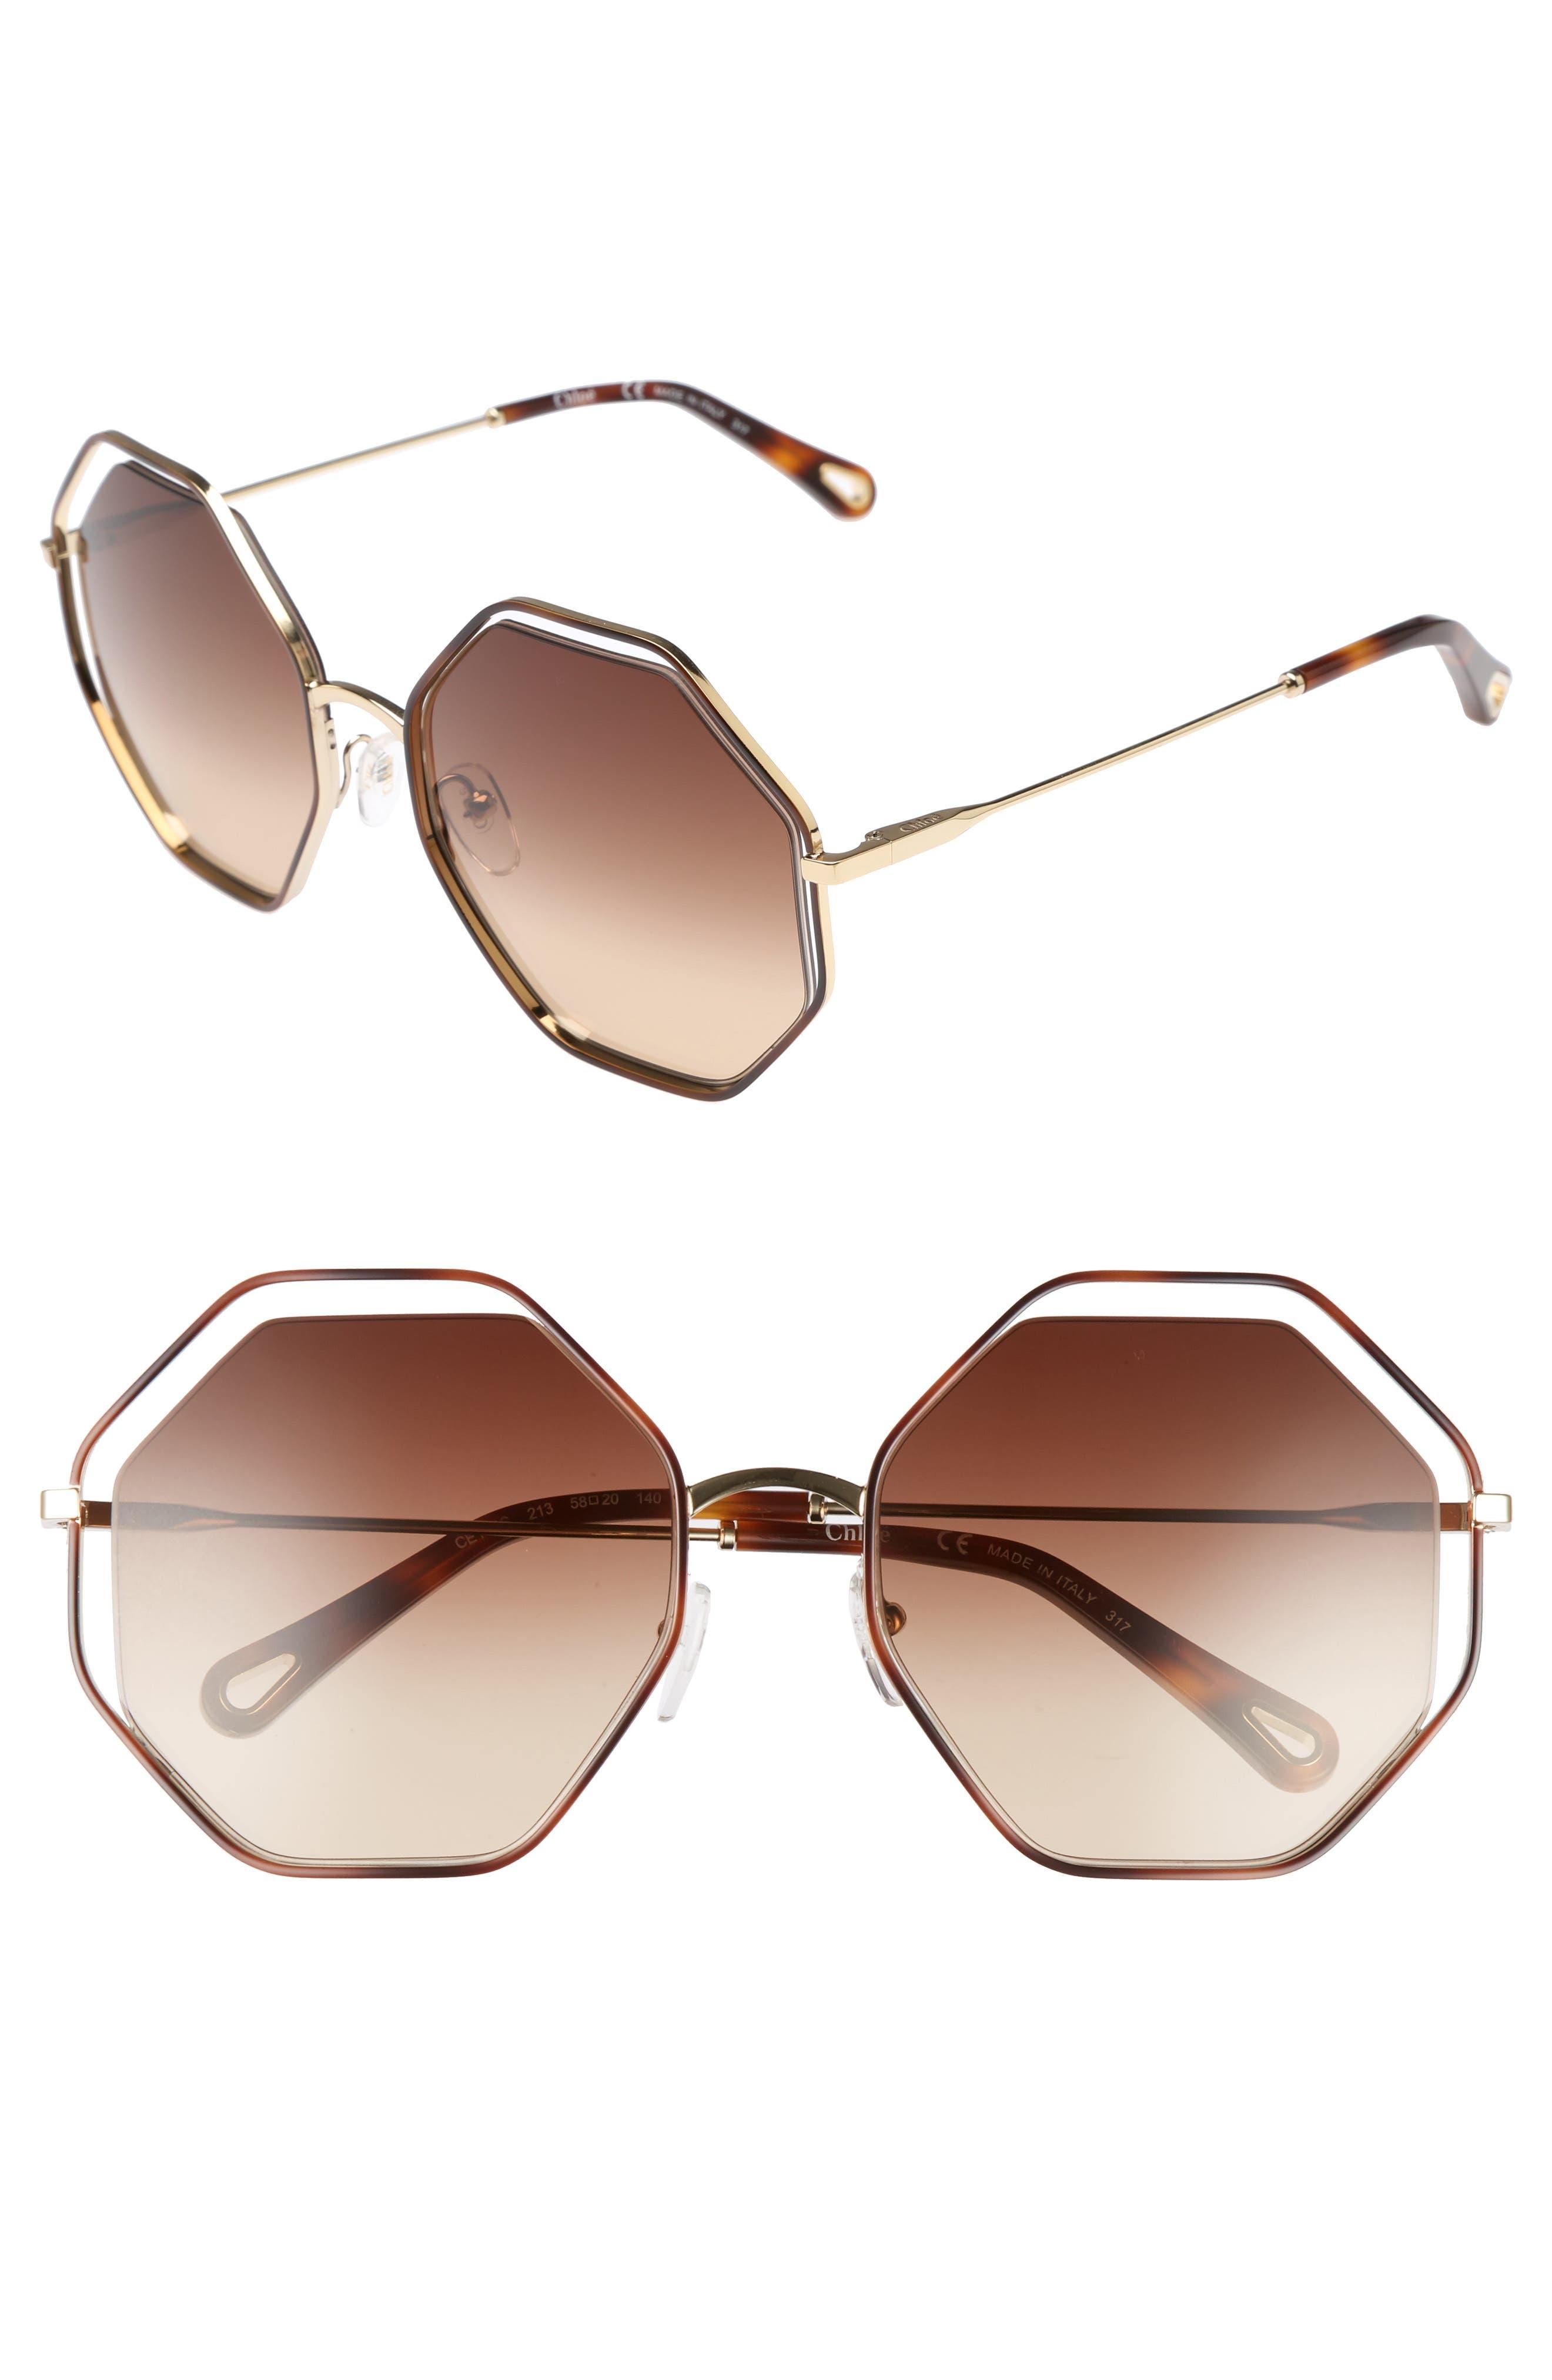 Chloe 5m Octagonal Halo Lens Sunglasses - Havana/ Brown